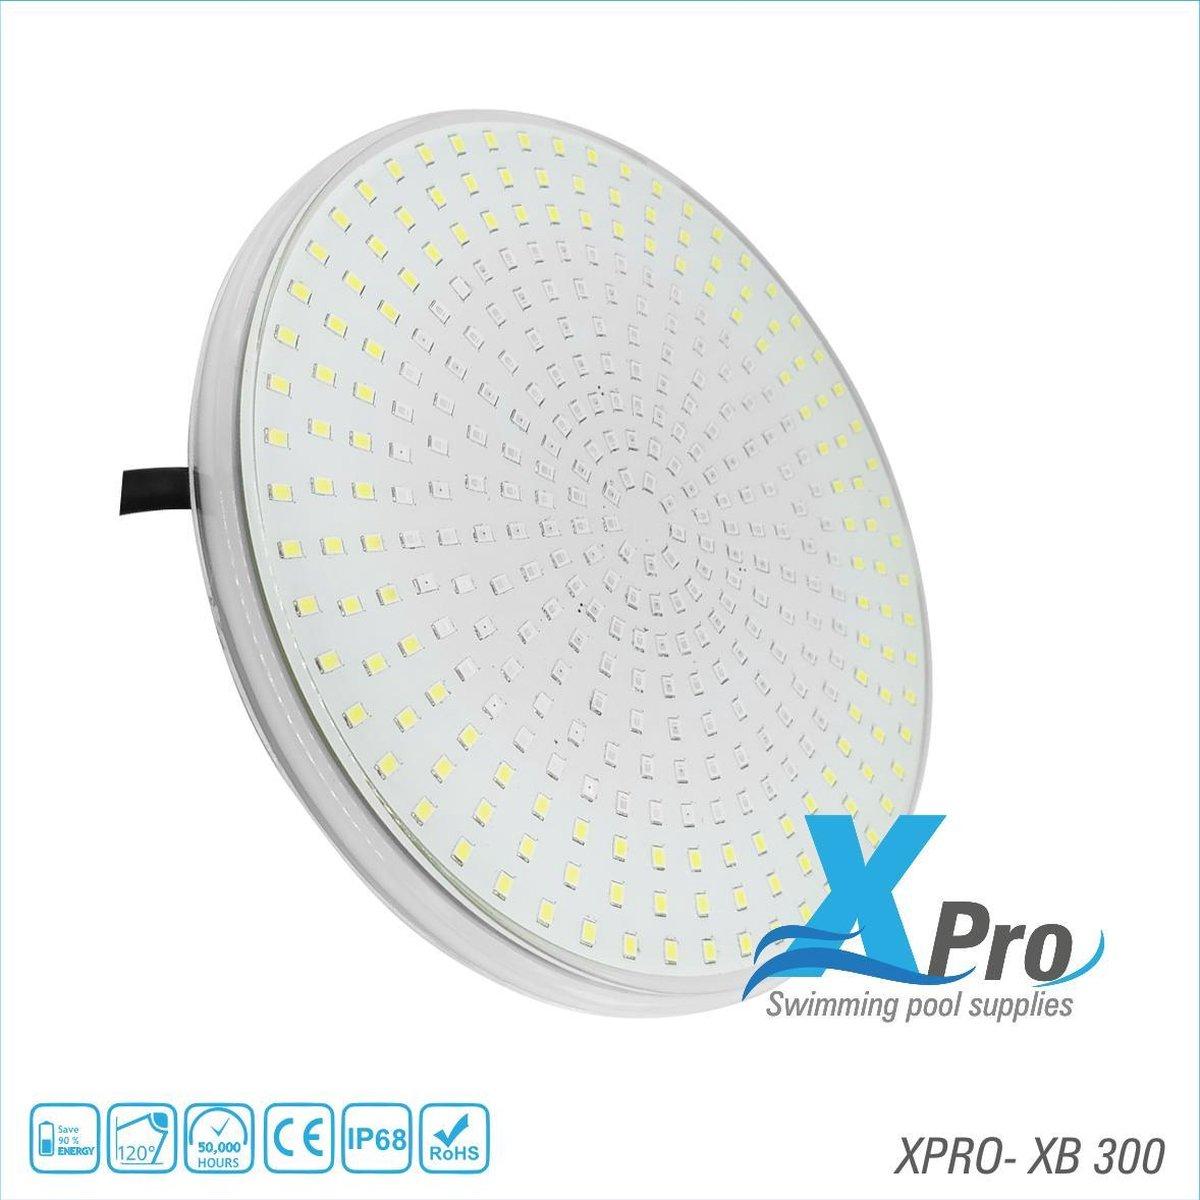 XPRO POOL | Led Zwembad Lamp | Warm wit | 501 LEDS | 35 Watt | PAR56